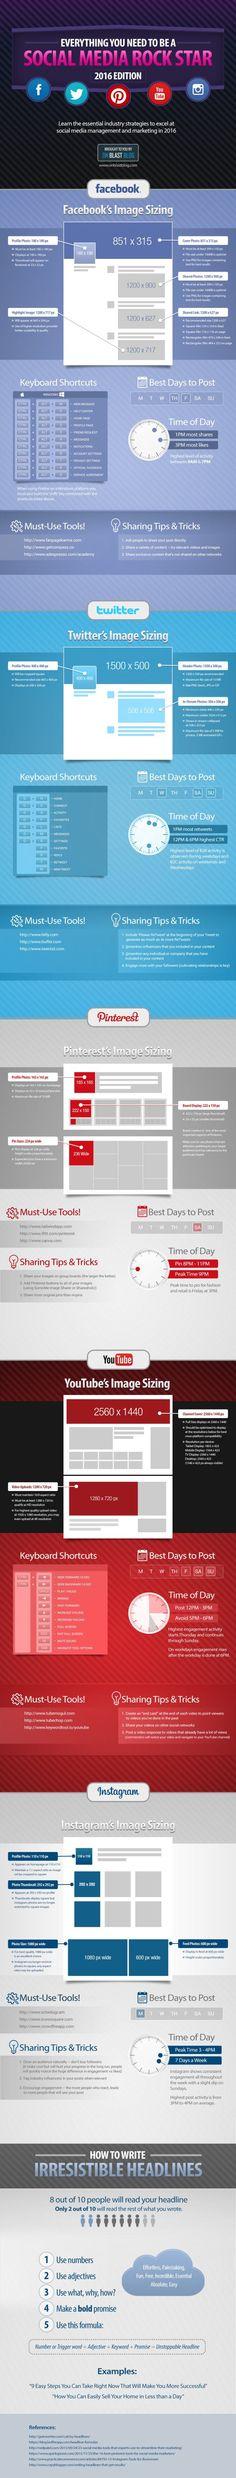 [Cool Infographic Friday] The Latest Social Media Image Sizes - SocialFish